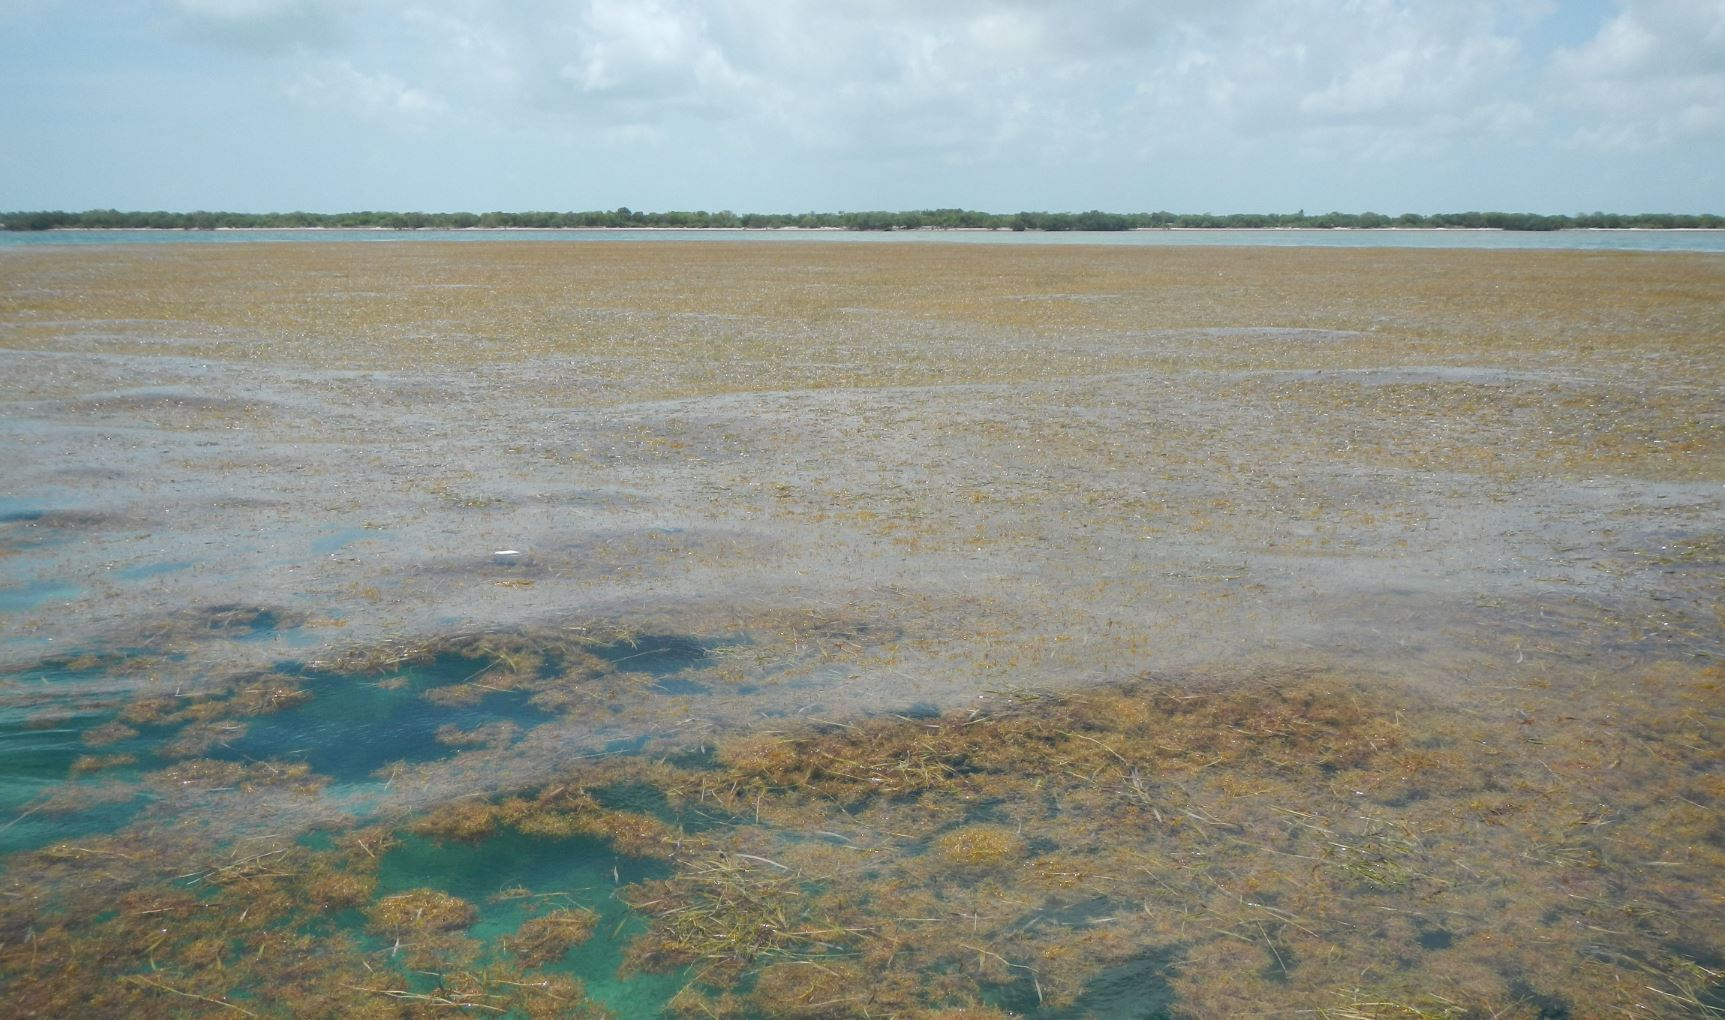 Image Credits: Sargassum off Big Pine Key in the lower Florida Keys. Credit: Brian Lapointe, Ph.D., Florida Atlantic University's Harbor Branch Oceanographic Institute